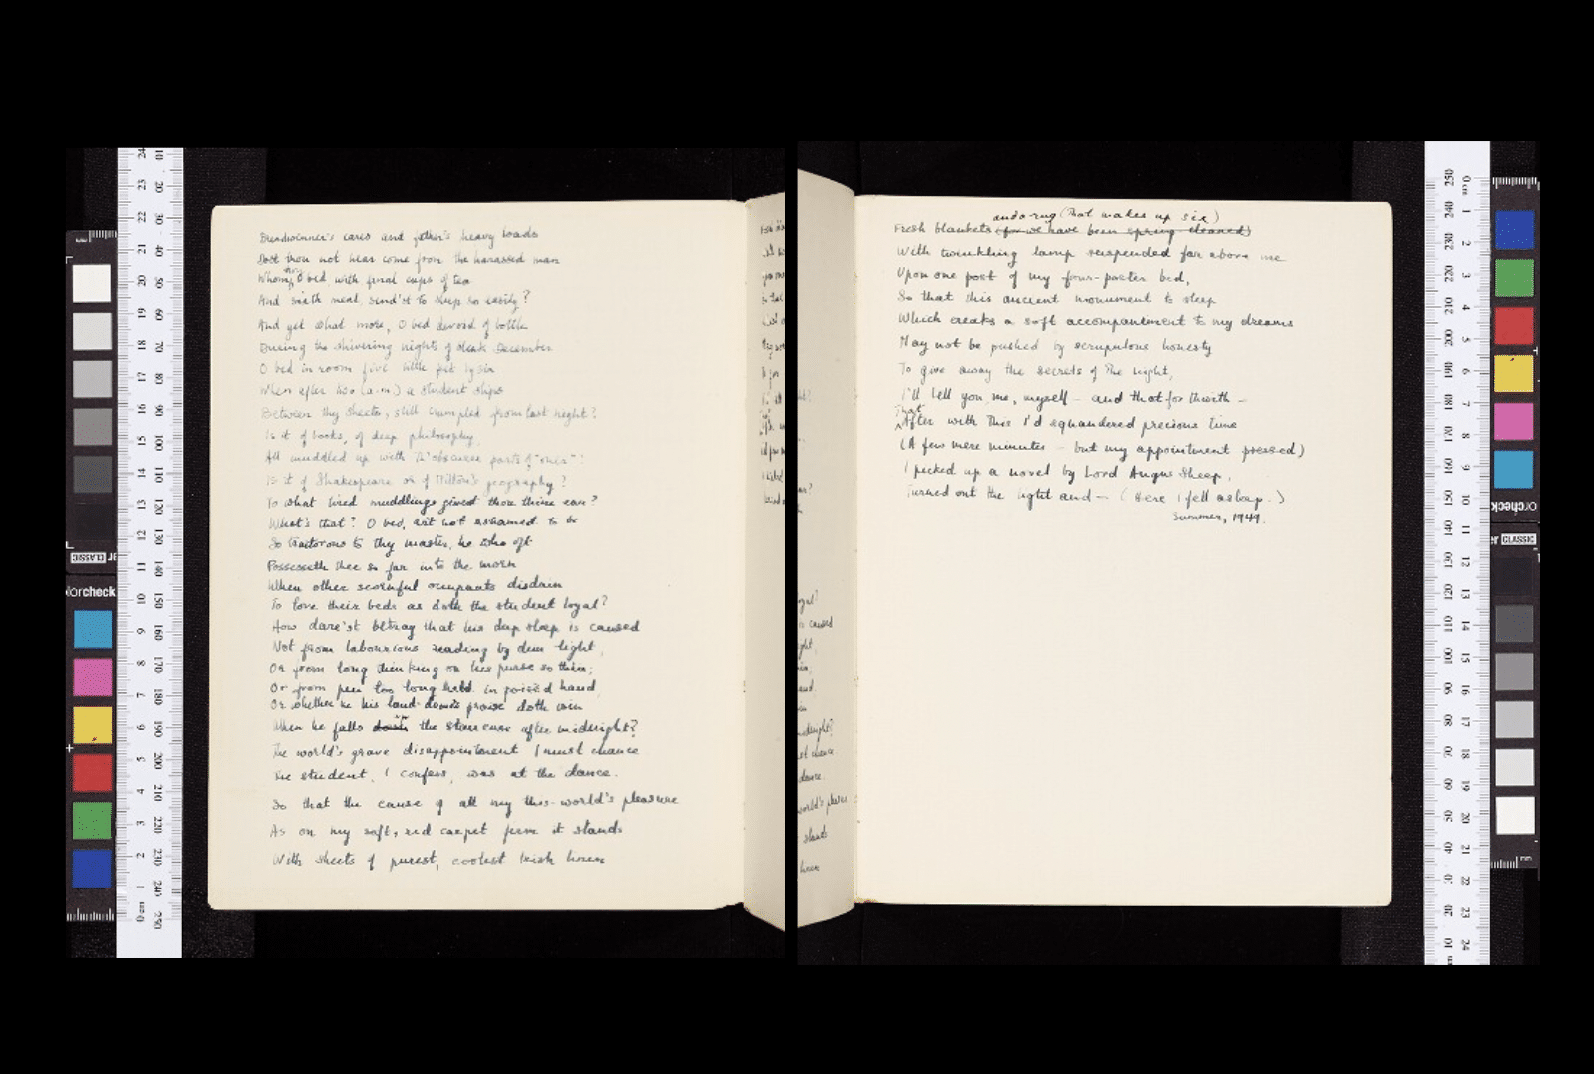 Original notebook belonging to poet Jenny Joseph